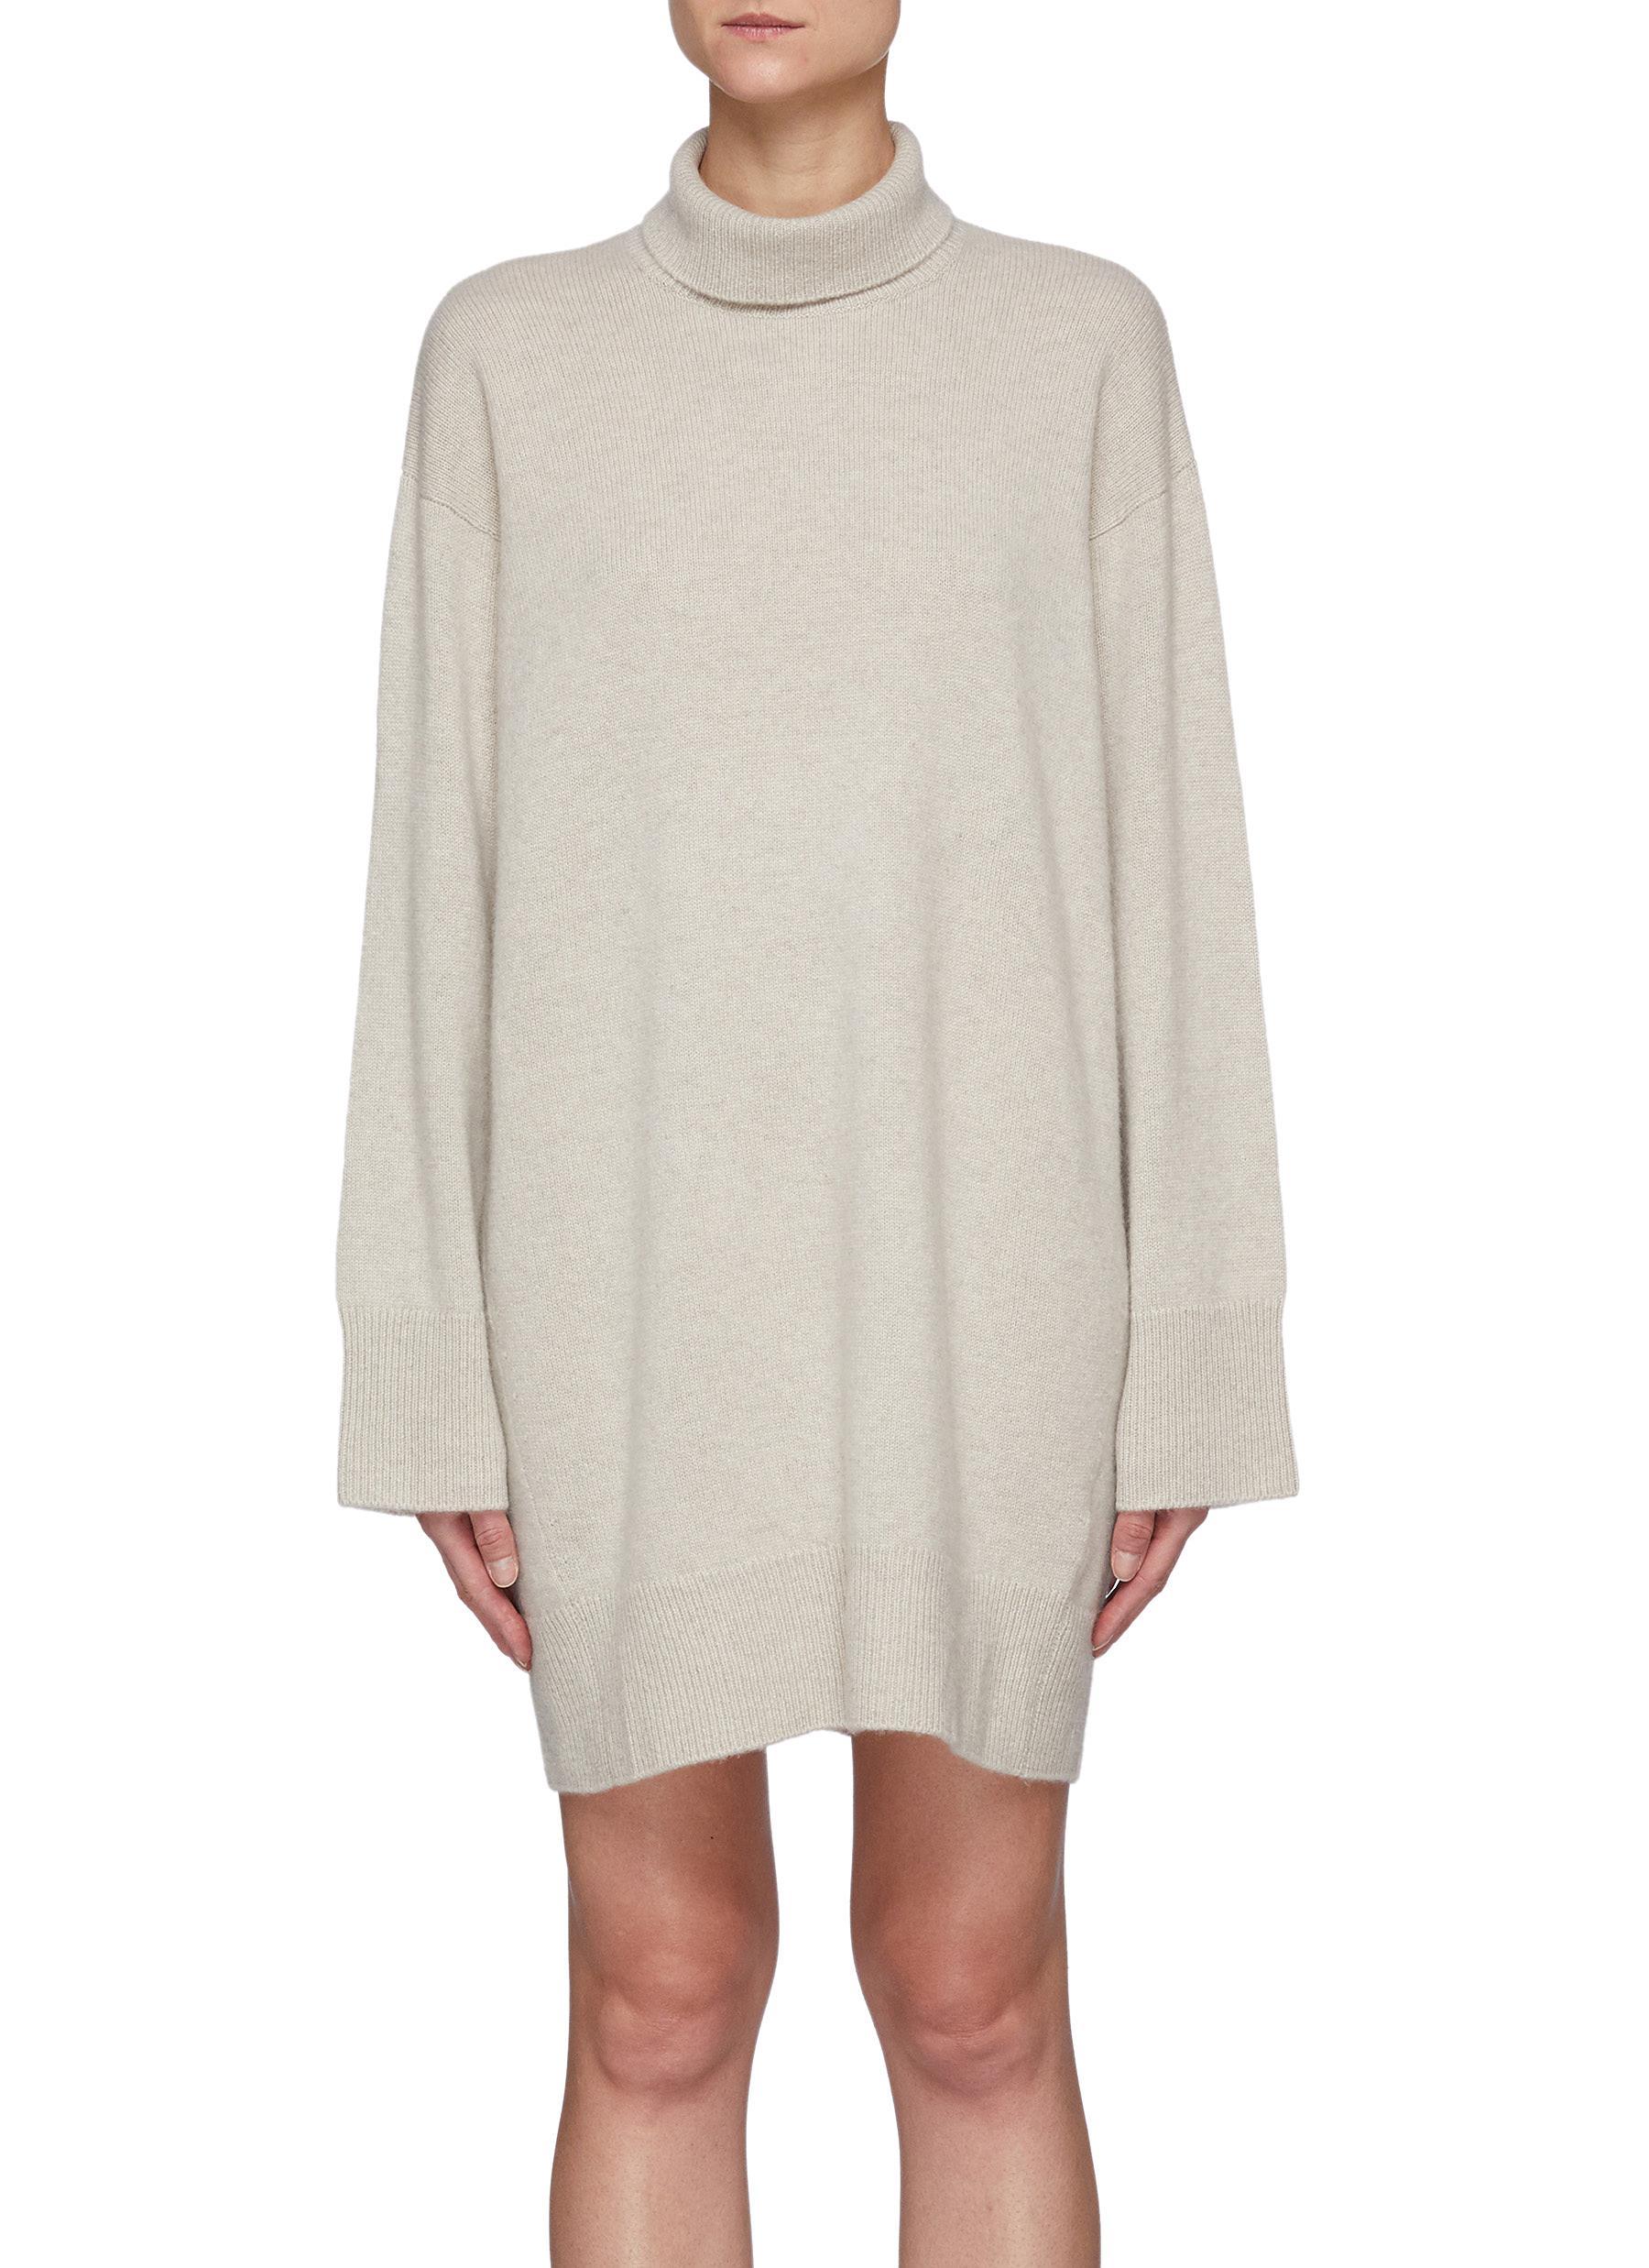 Kalmar' High Neck Organic Cashmere Above Knee Dress